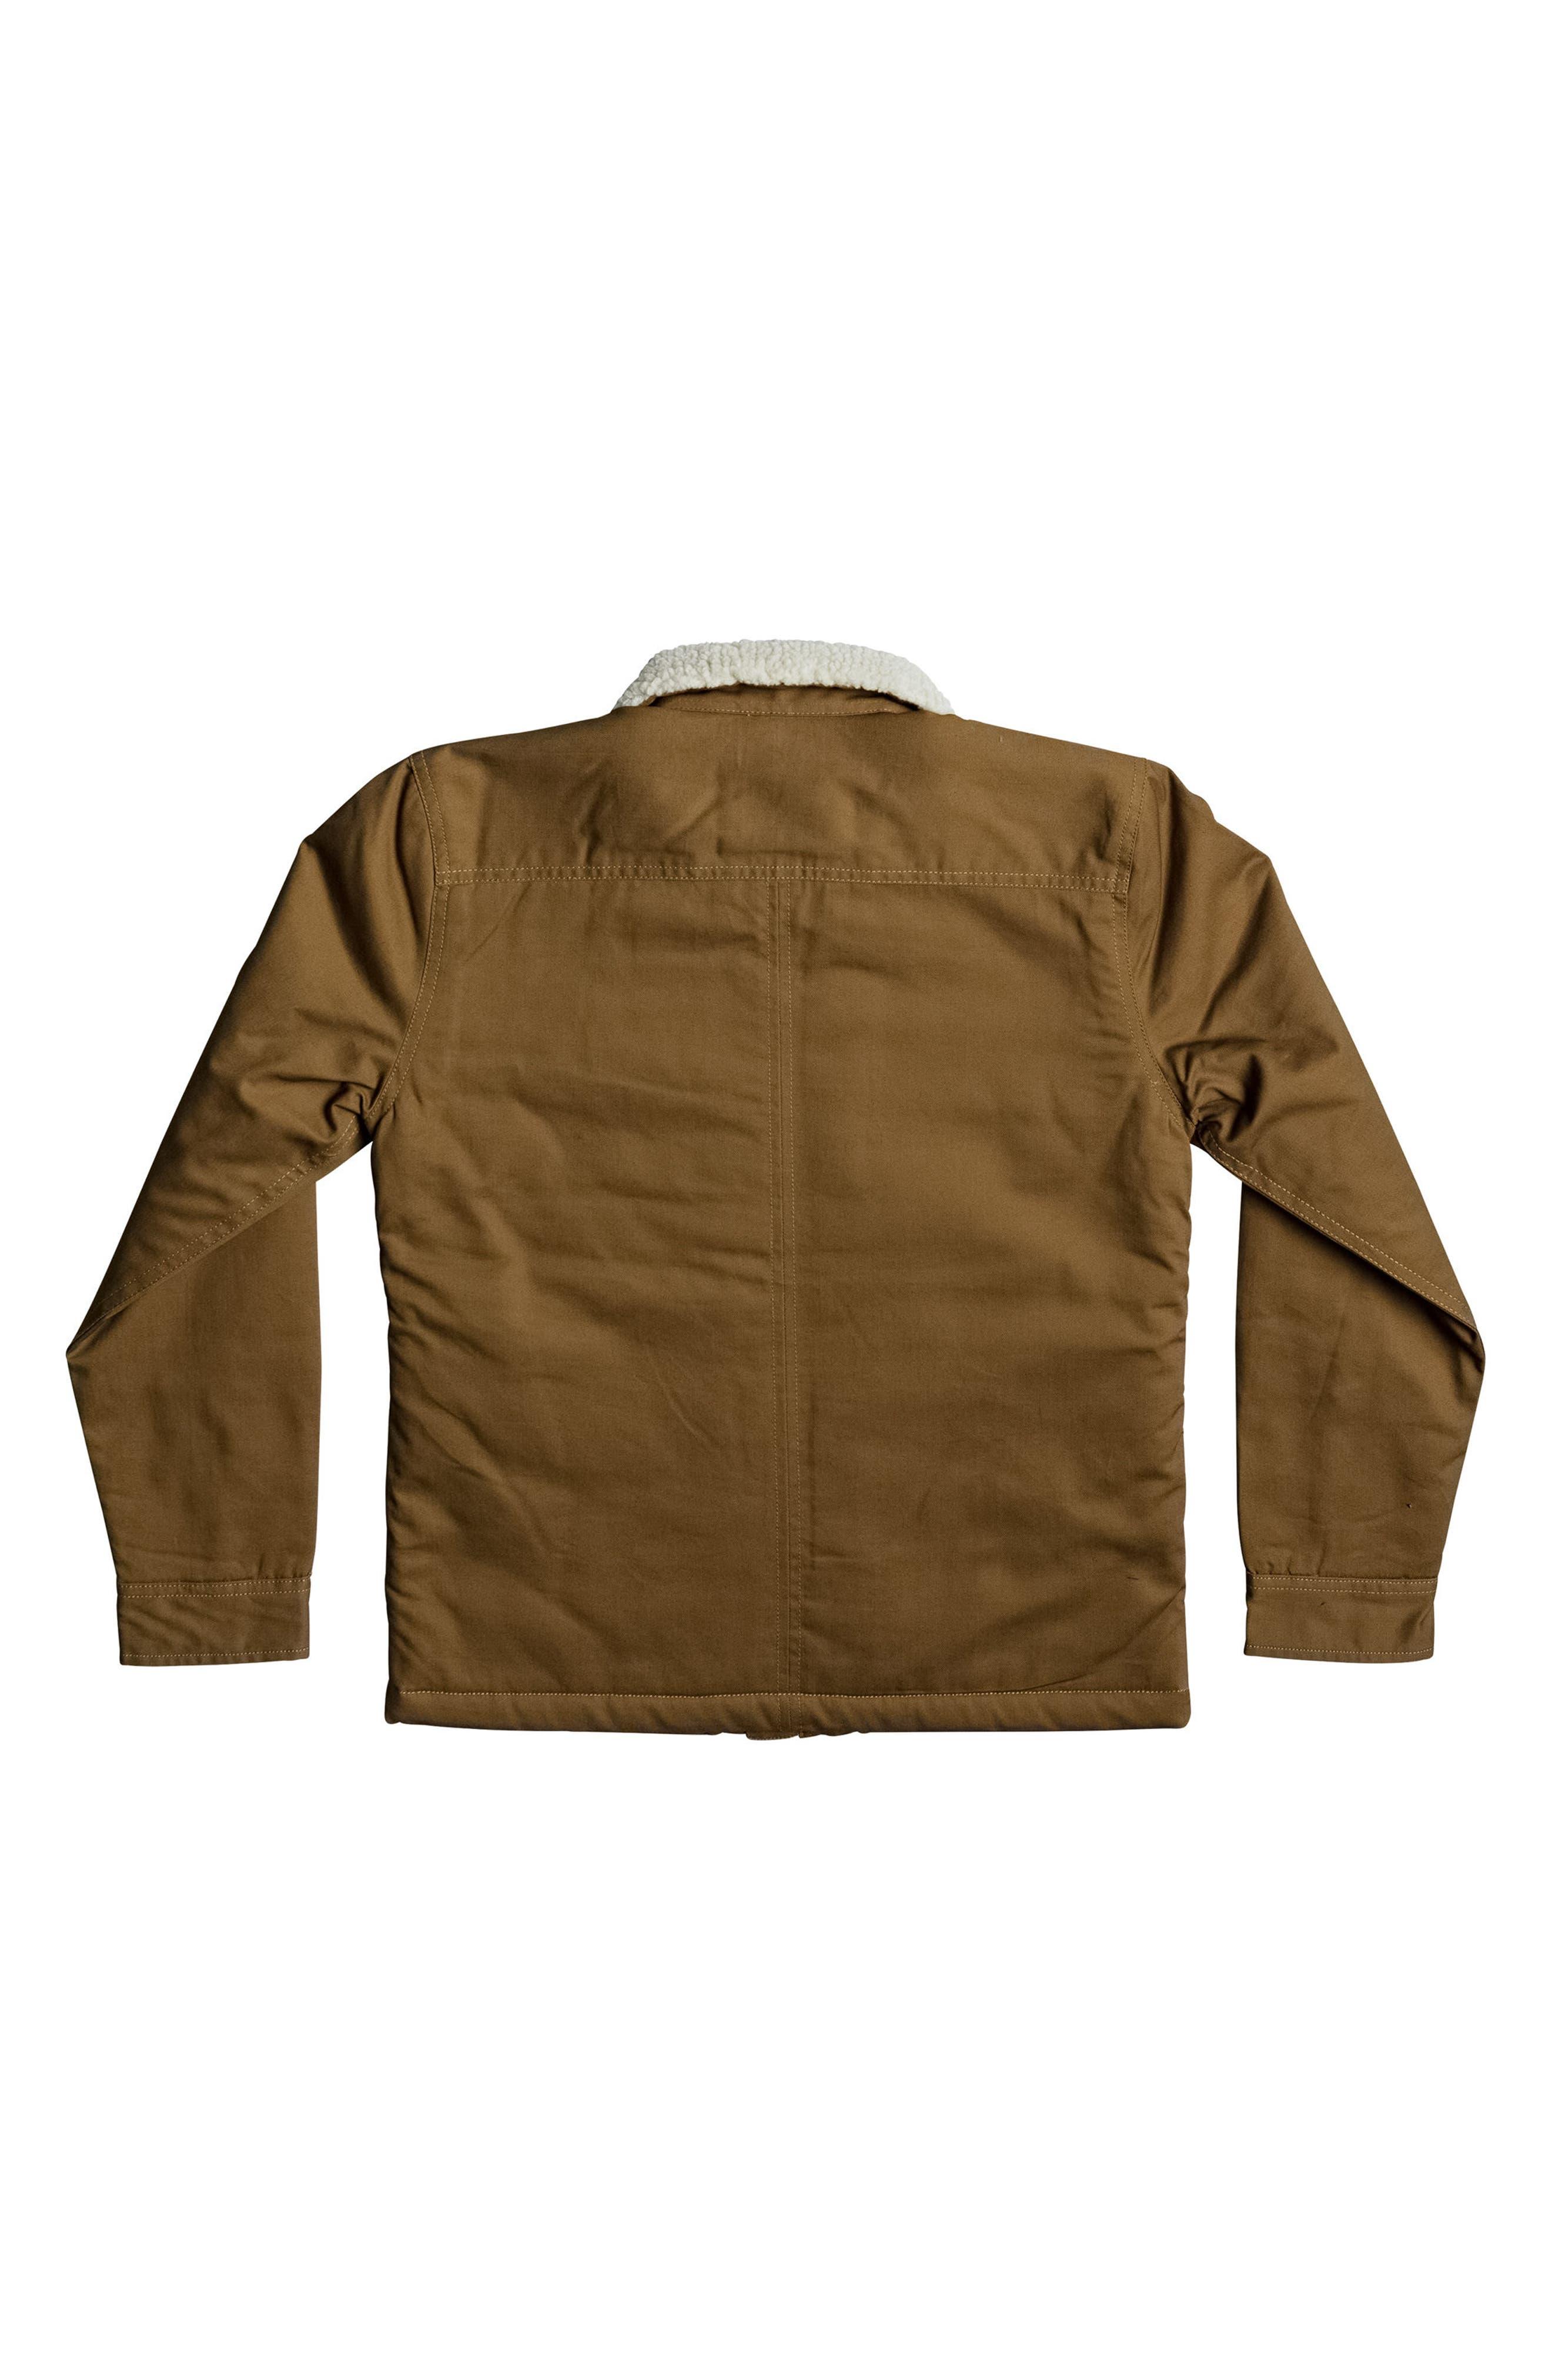 Dabein Fleece Lined Jacket,                             Alternate thumbnail 2, color,                             Rubber